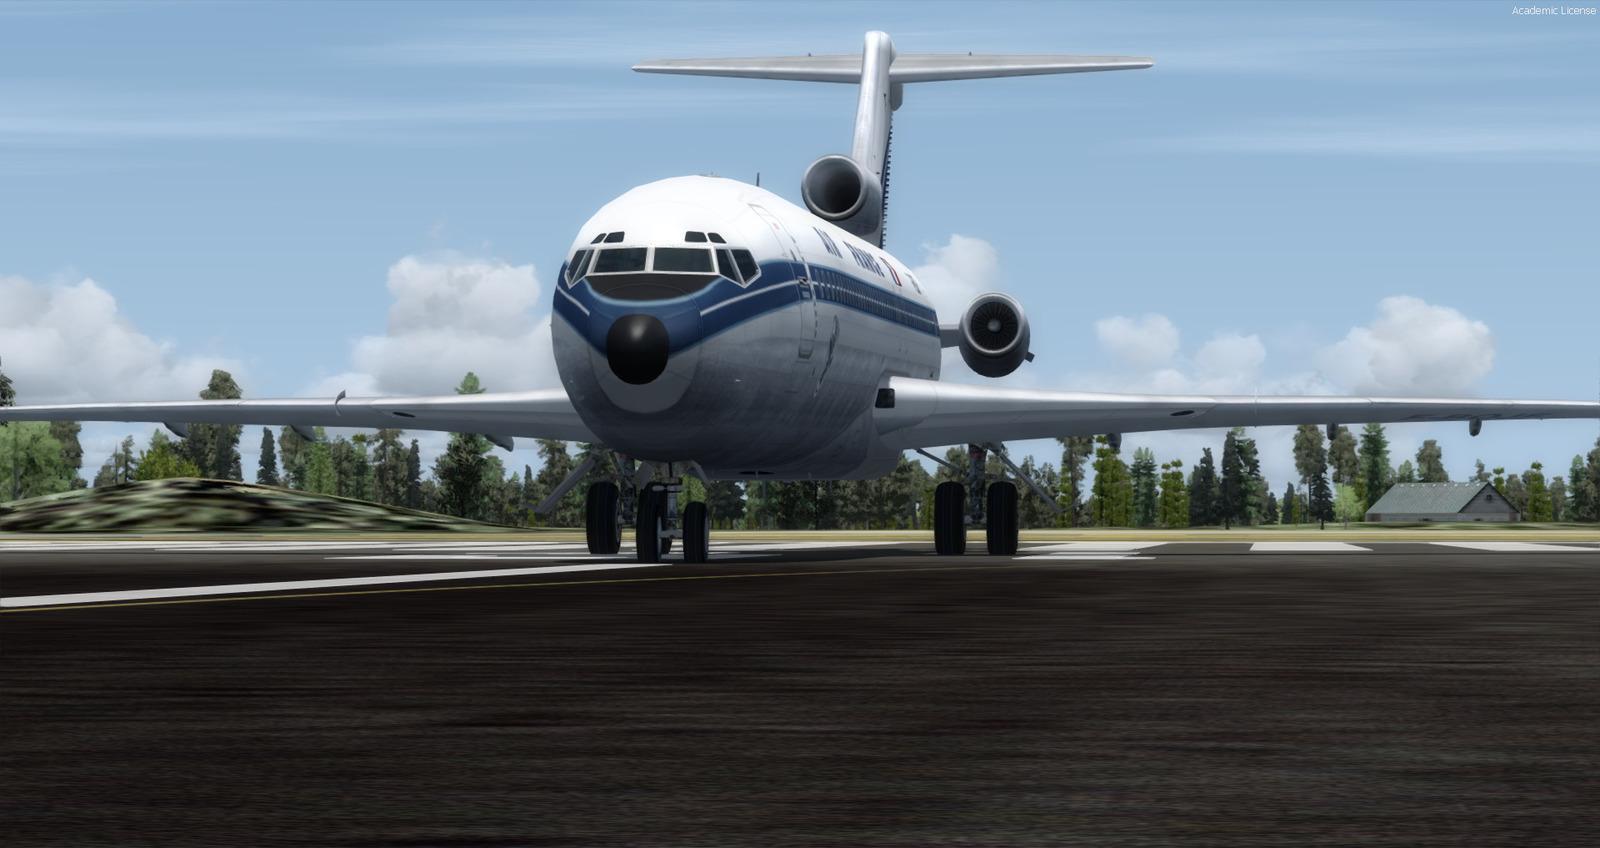 727 aircraft missing